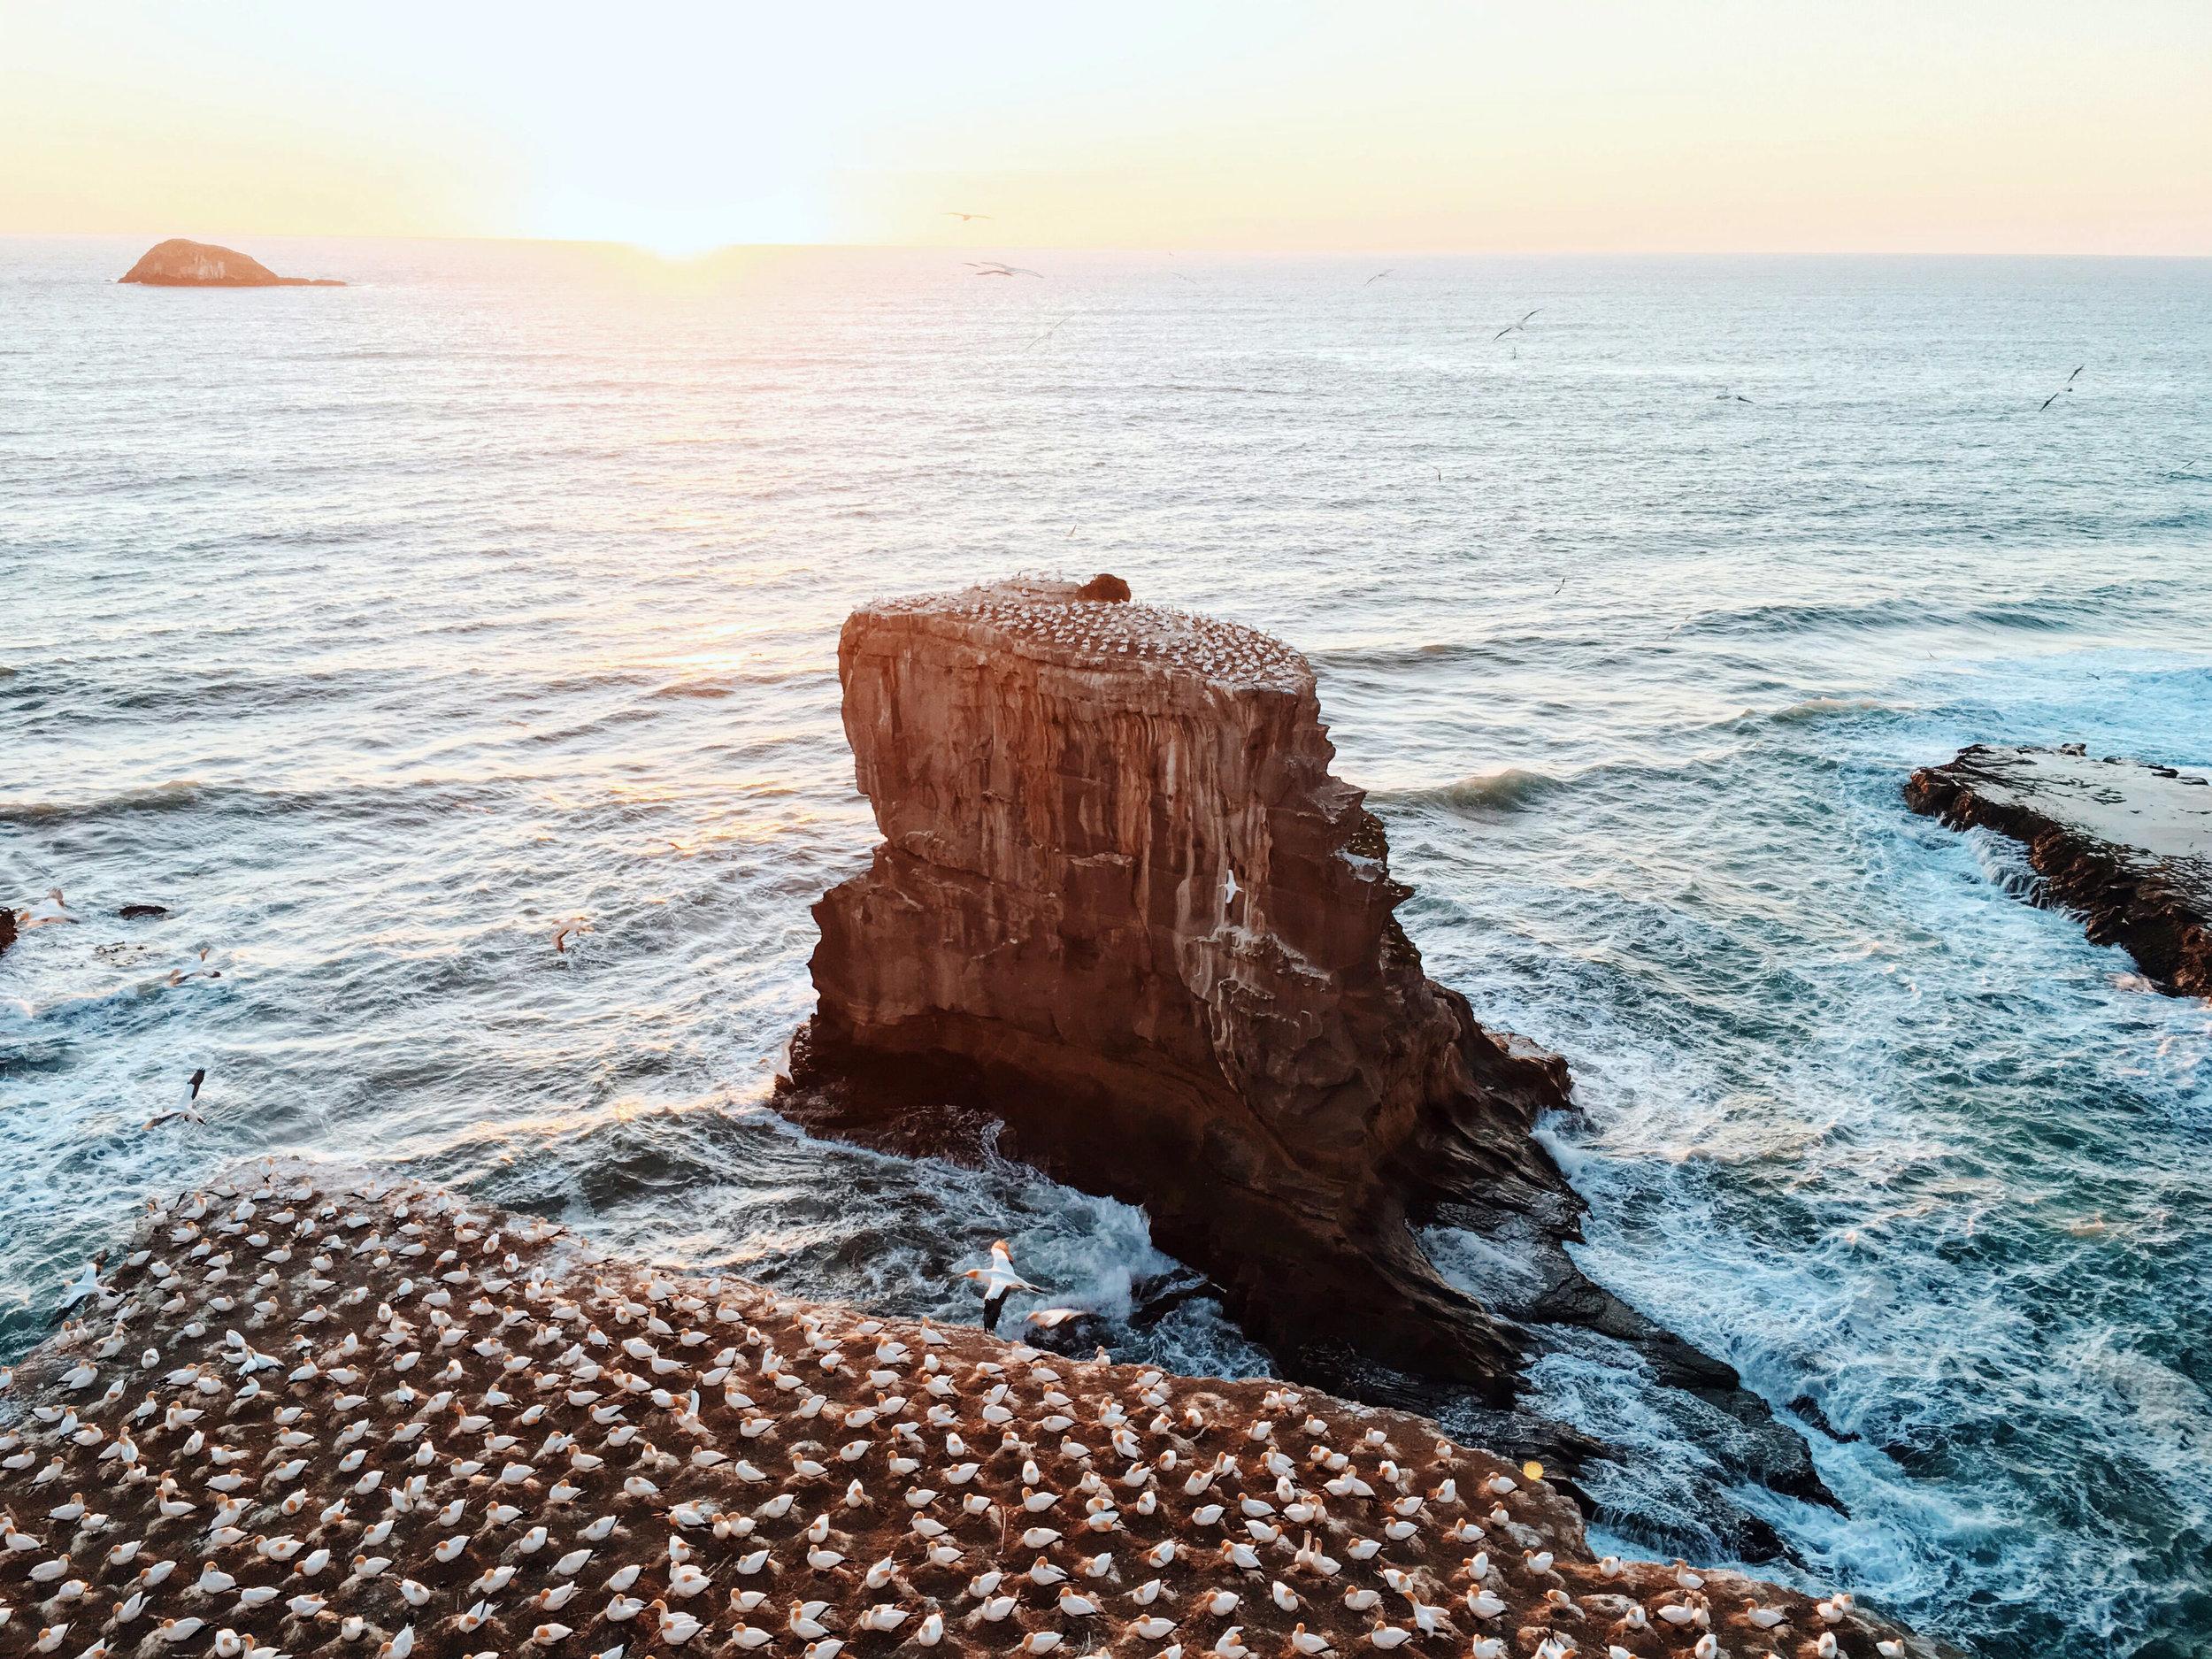 birds-settled-on-rocks-on-the-seashore-in-new-zealand.jpg